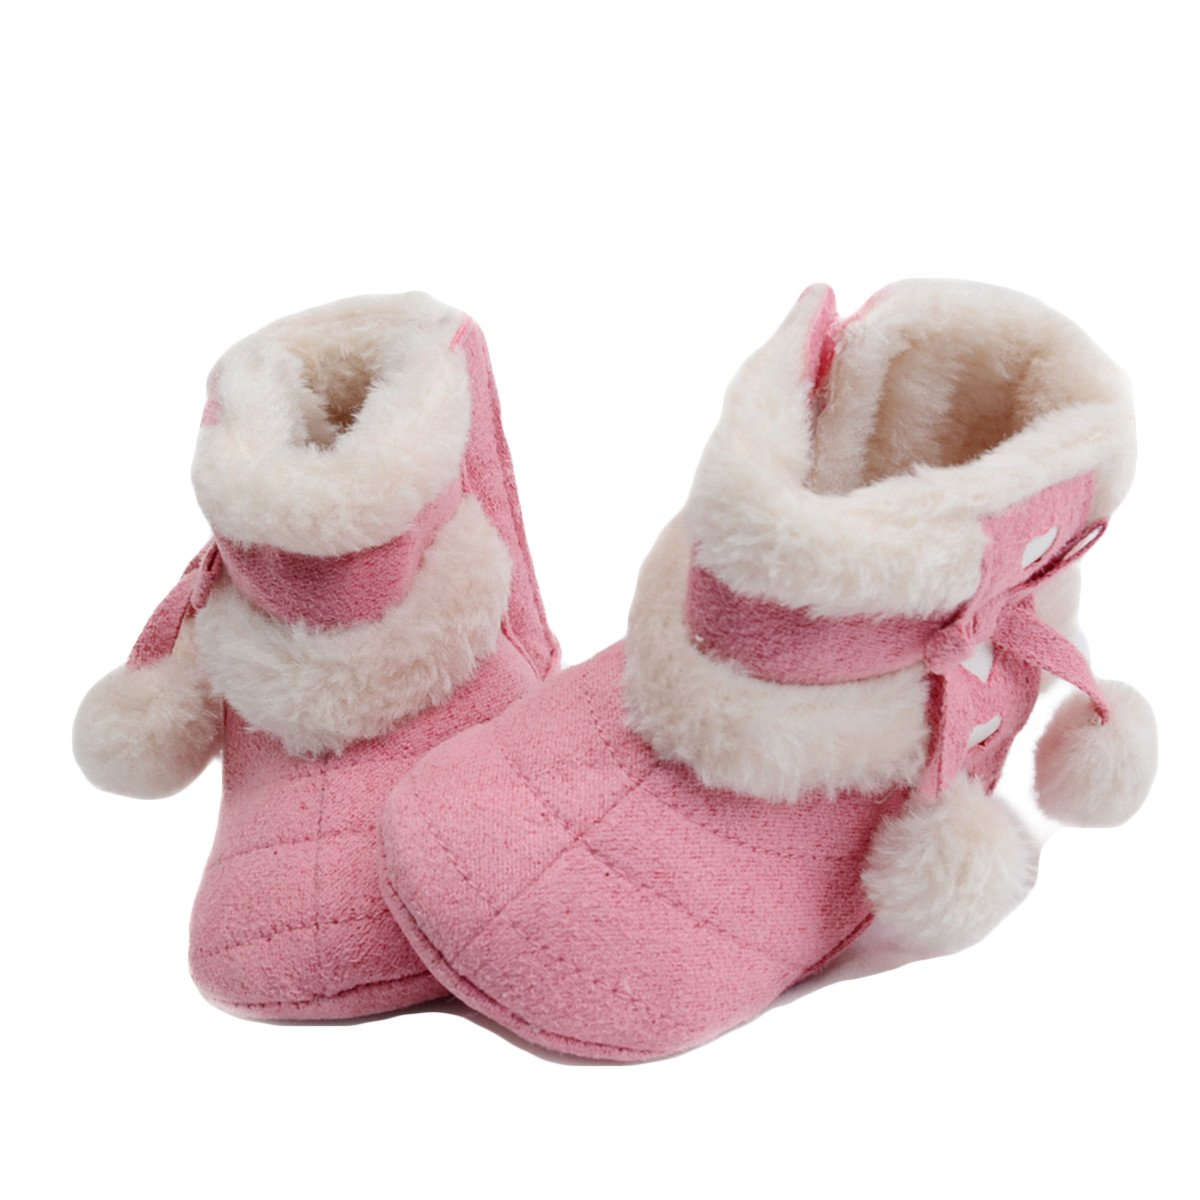 Toddler Newborn Babys Warm Snow Non-slip Boots Soft Bottom Ball Bowknot Shoes